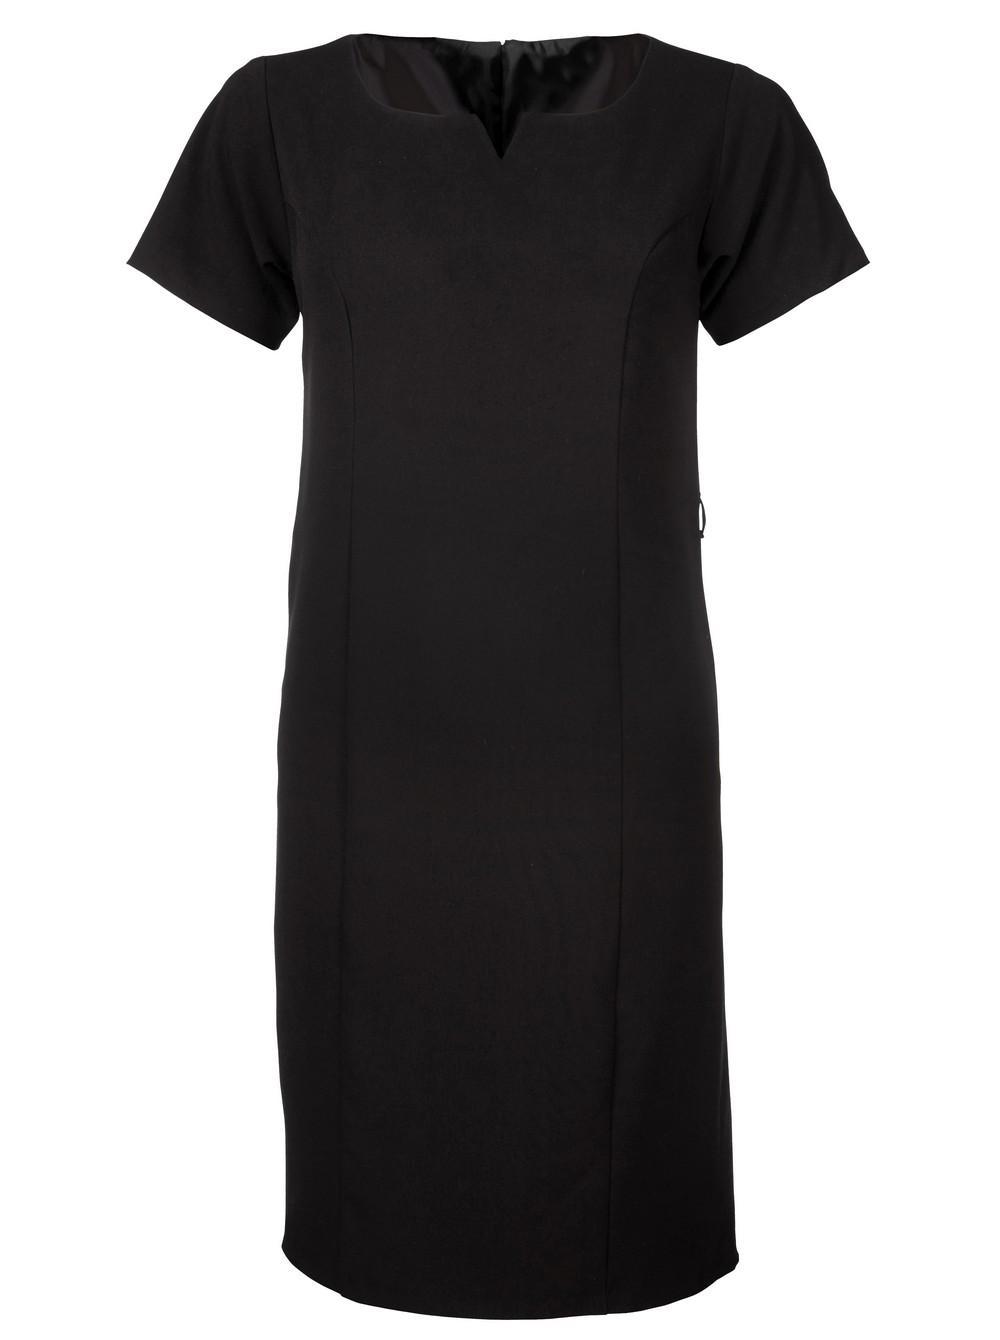 Carol 599 S/s Dress - Black